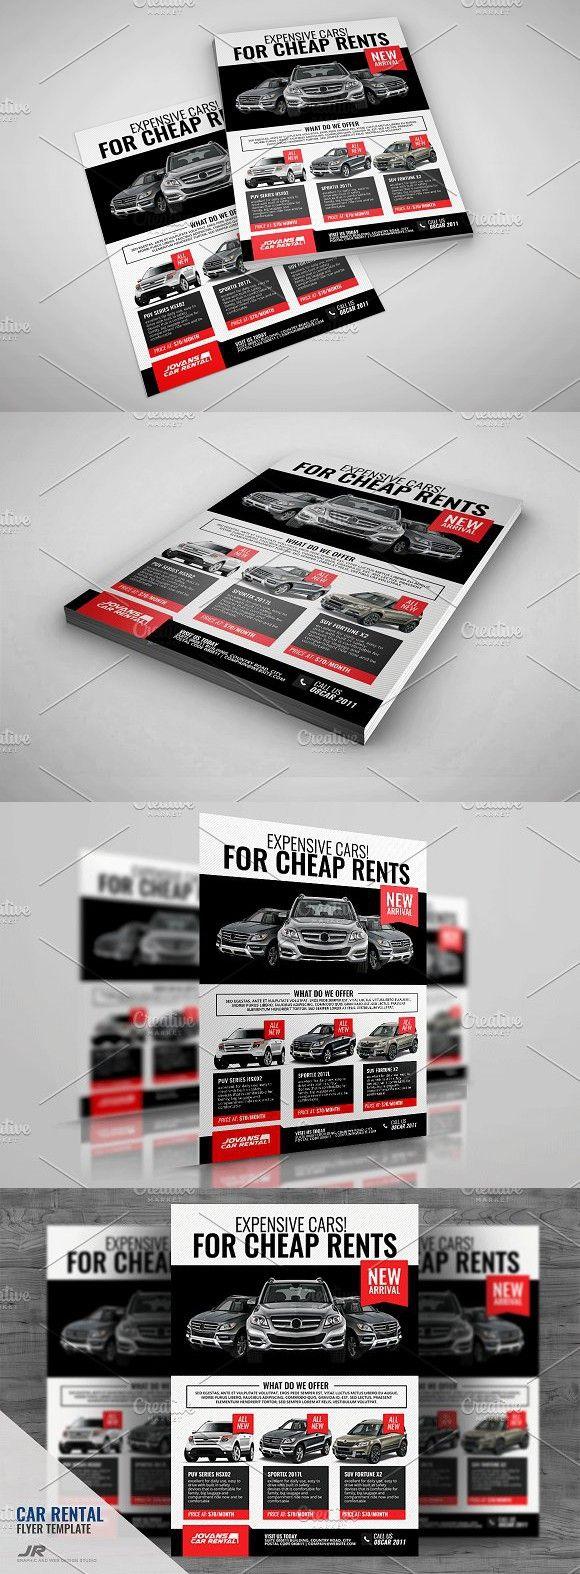 Car Rental and Dealership Flyer. A4 Flyer